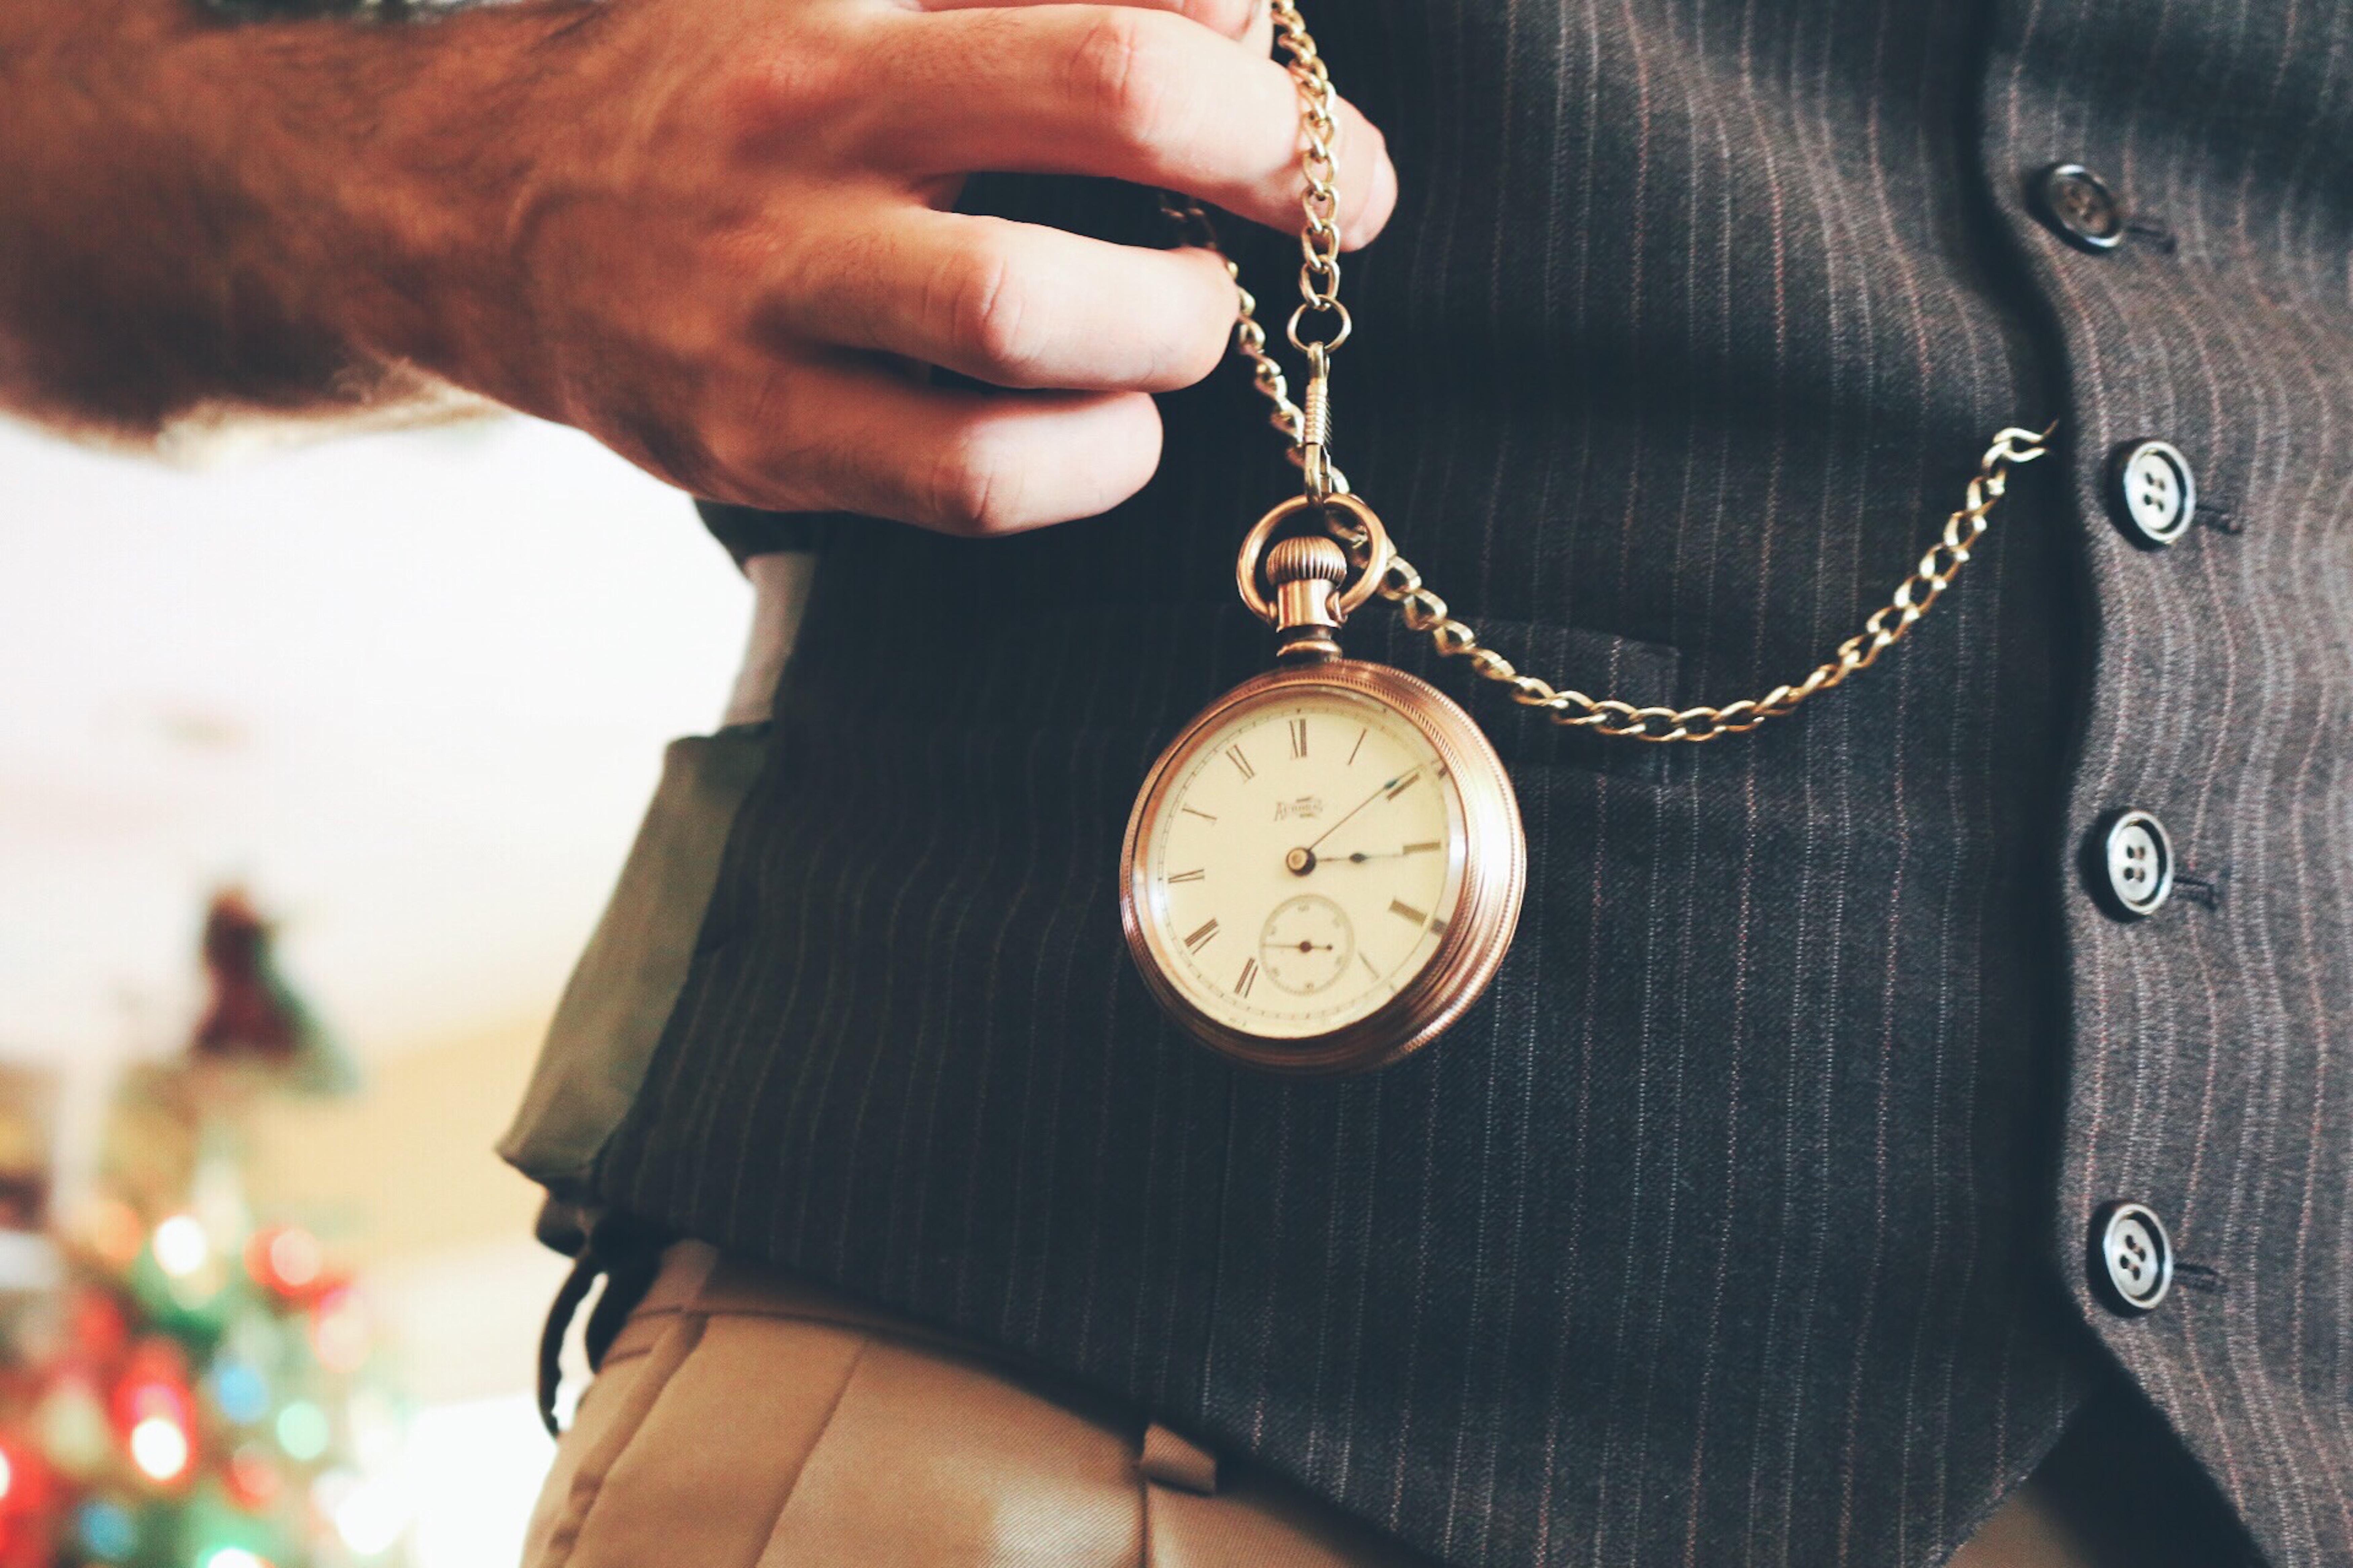 Pocket watch held next to a waistcoat